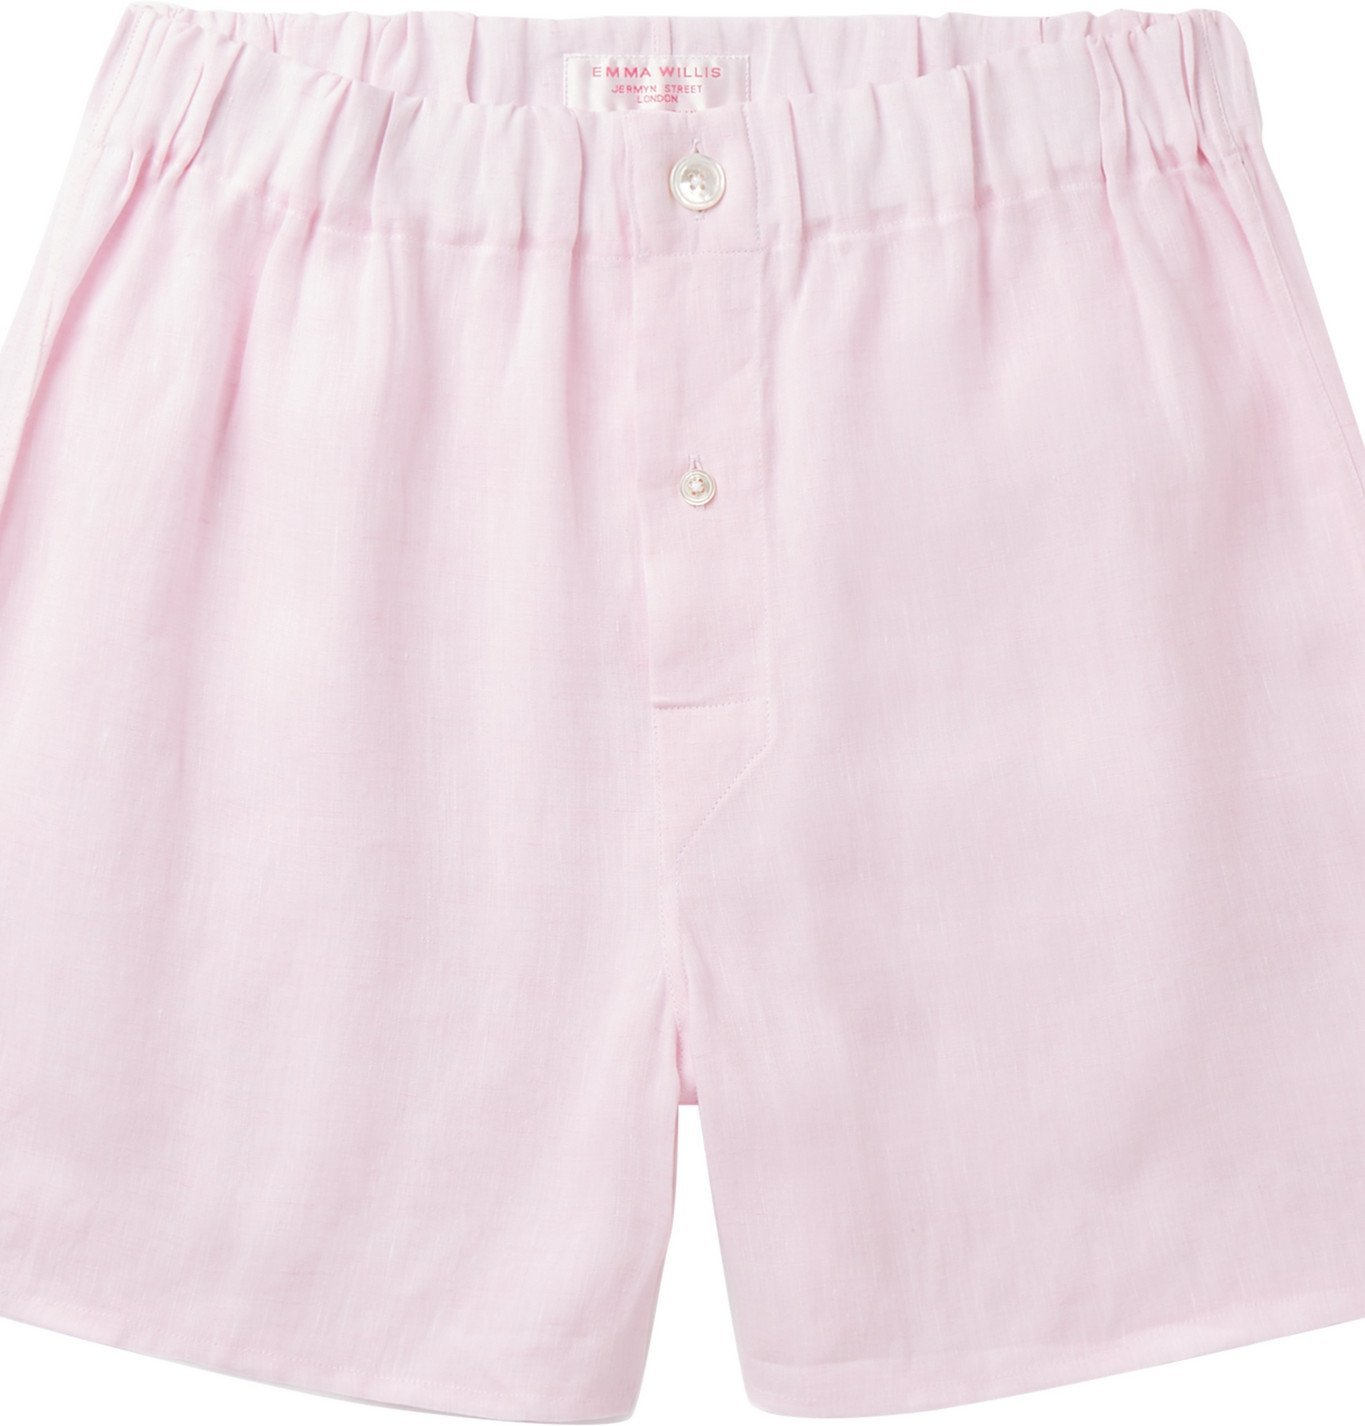 Photo: Emma Willis - Linen Boxer Shorts - Pink